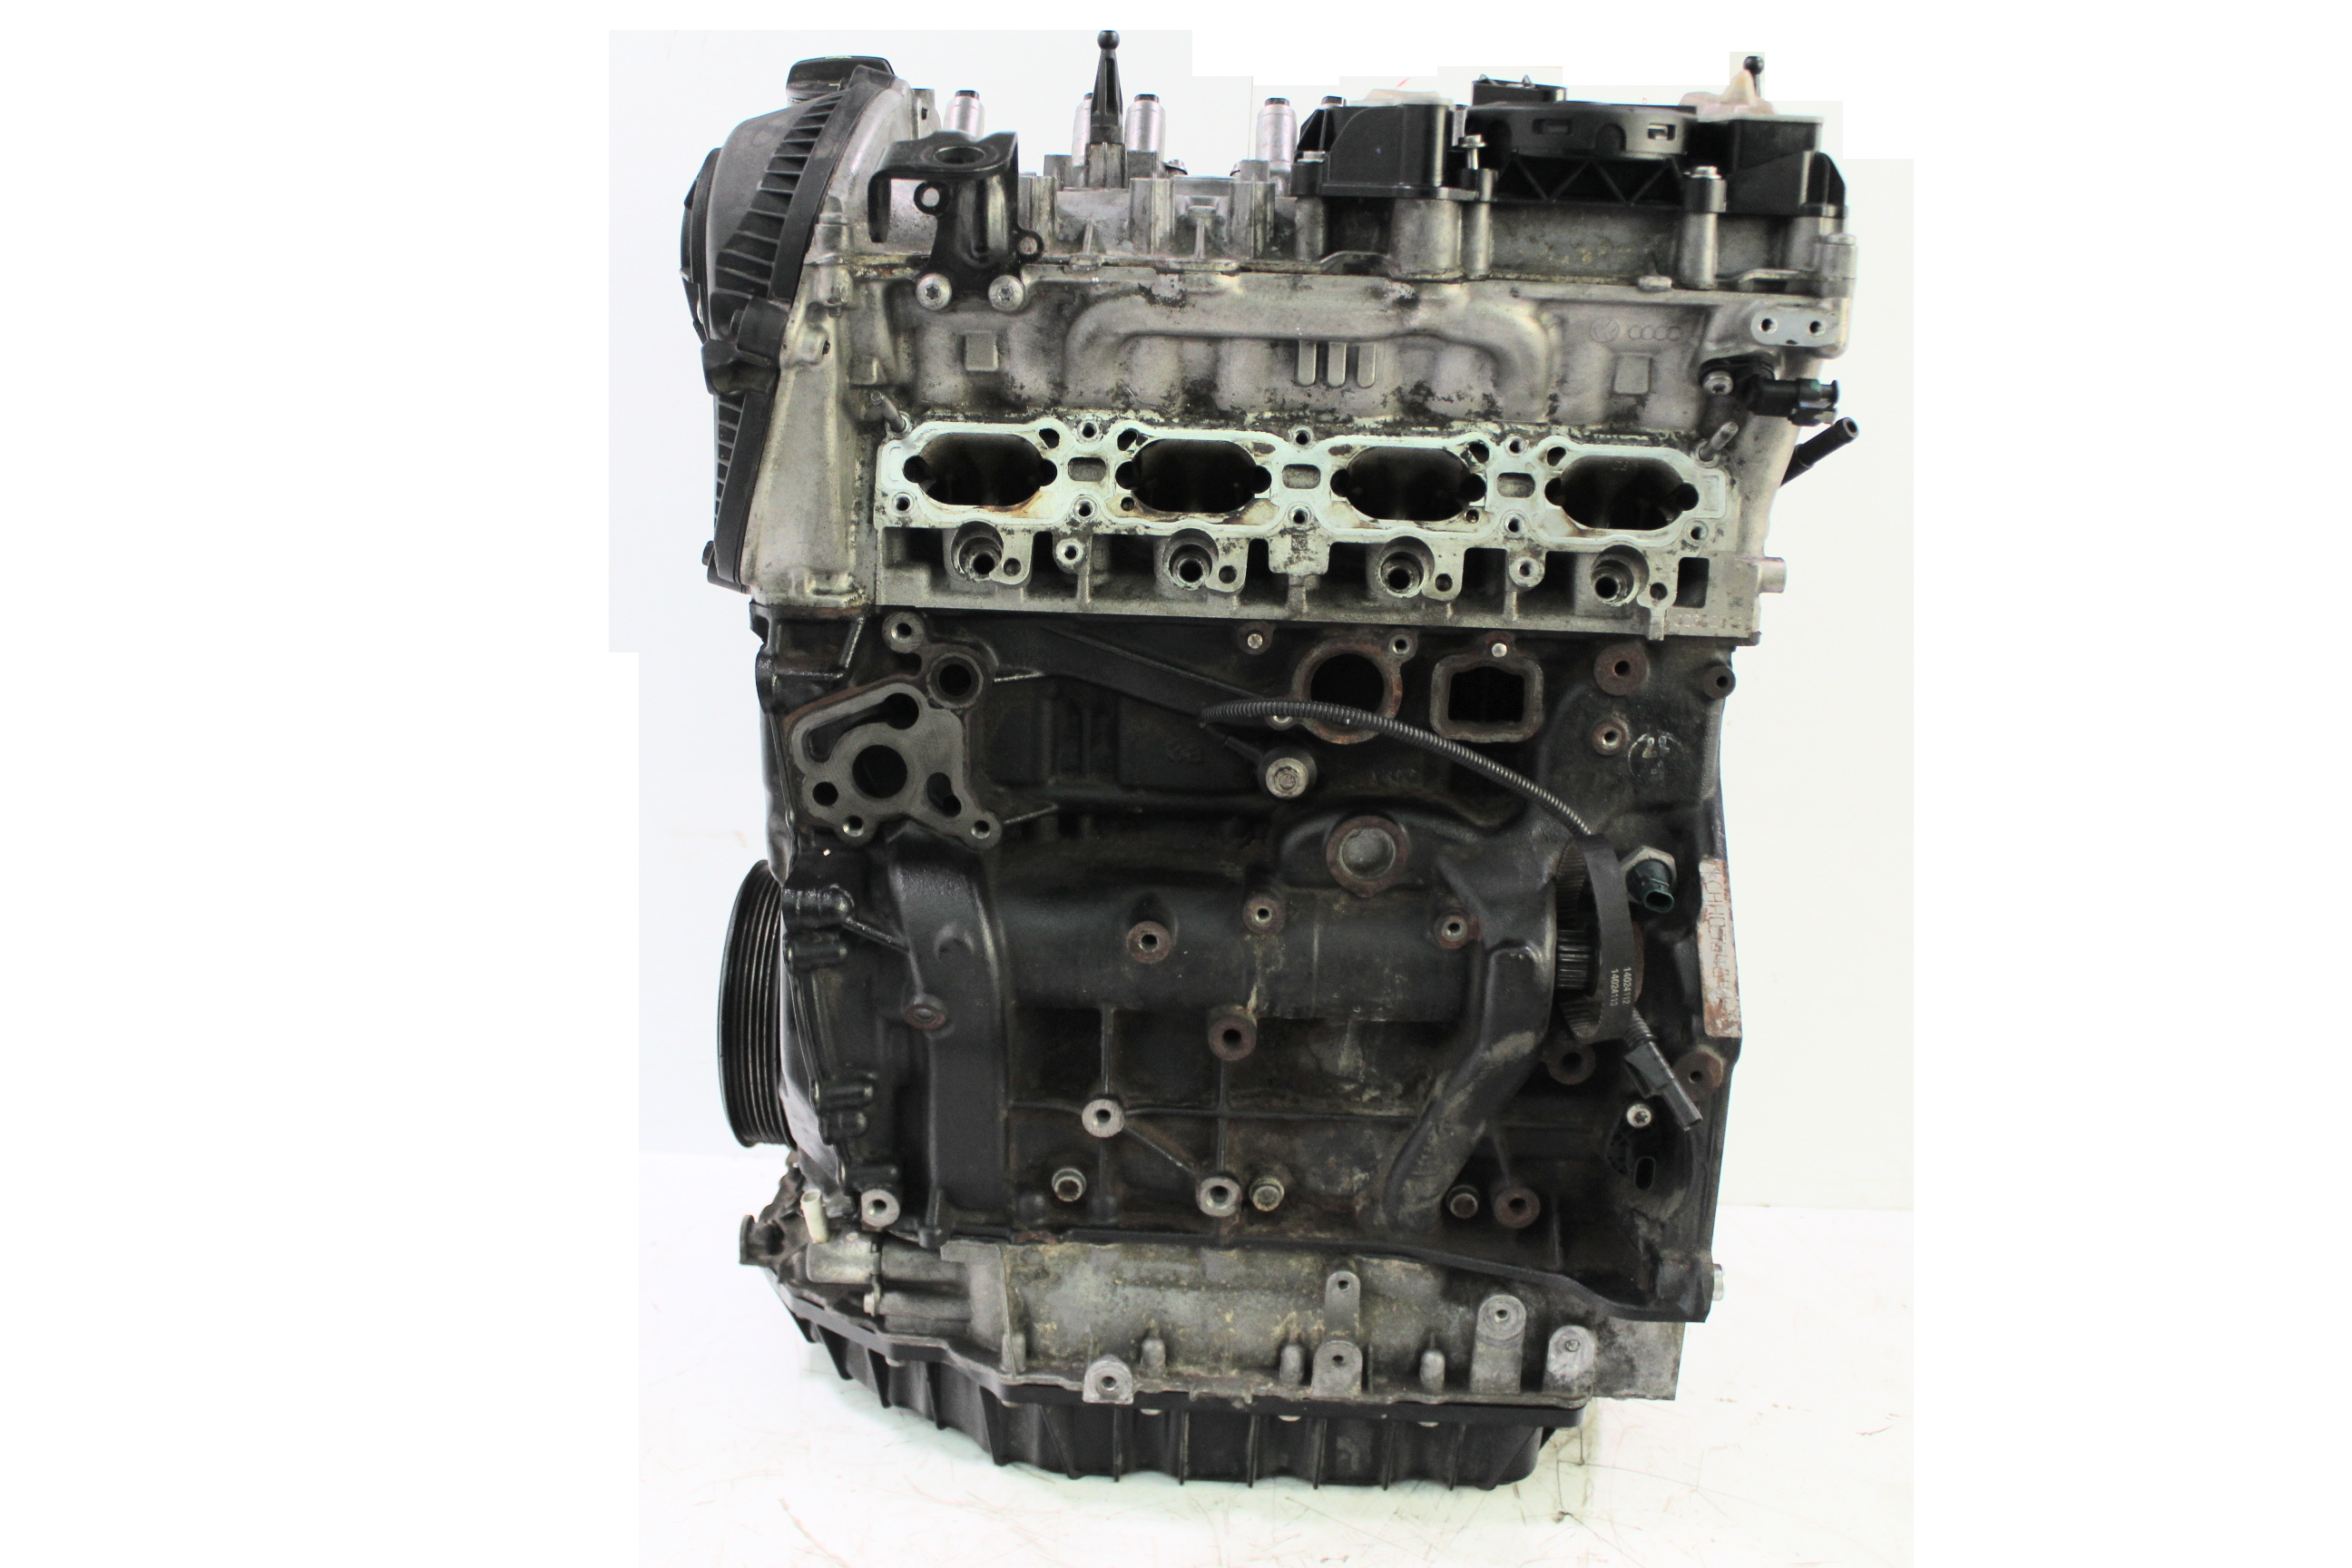 Motor 2014 Audi VW Skoda Golf TT Tiguan Passat 2,0 TSI TFSI CHH CHHA CHHB CHHC